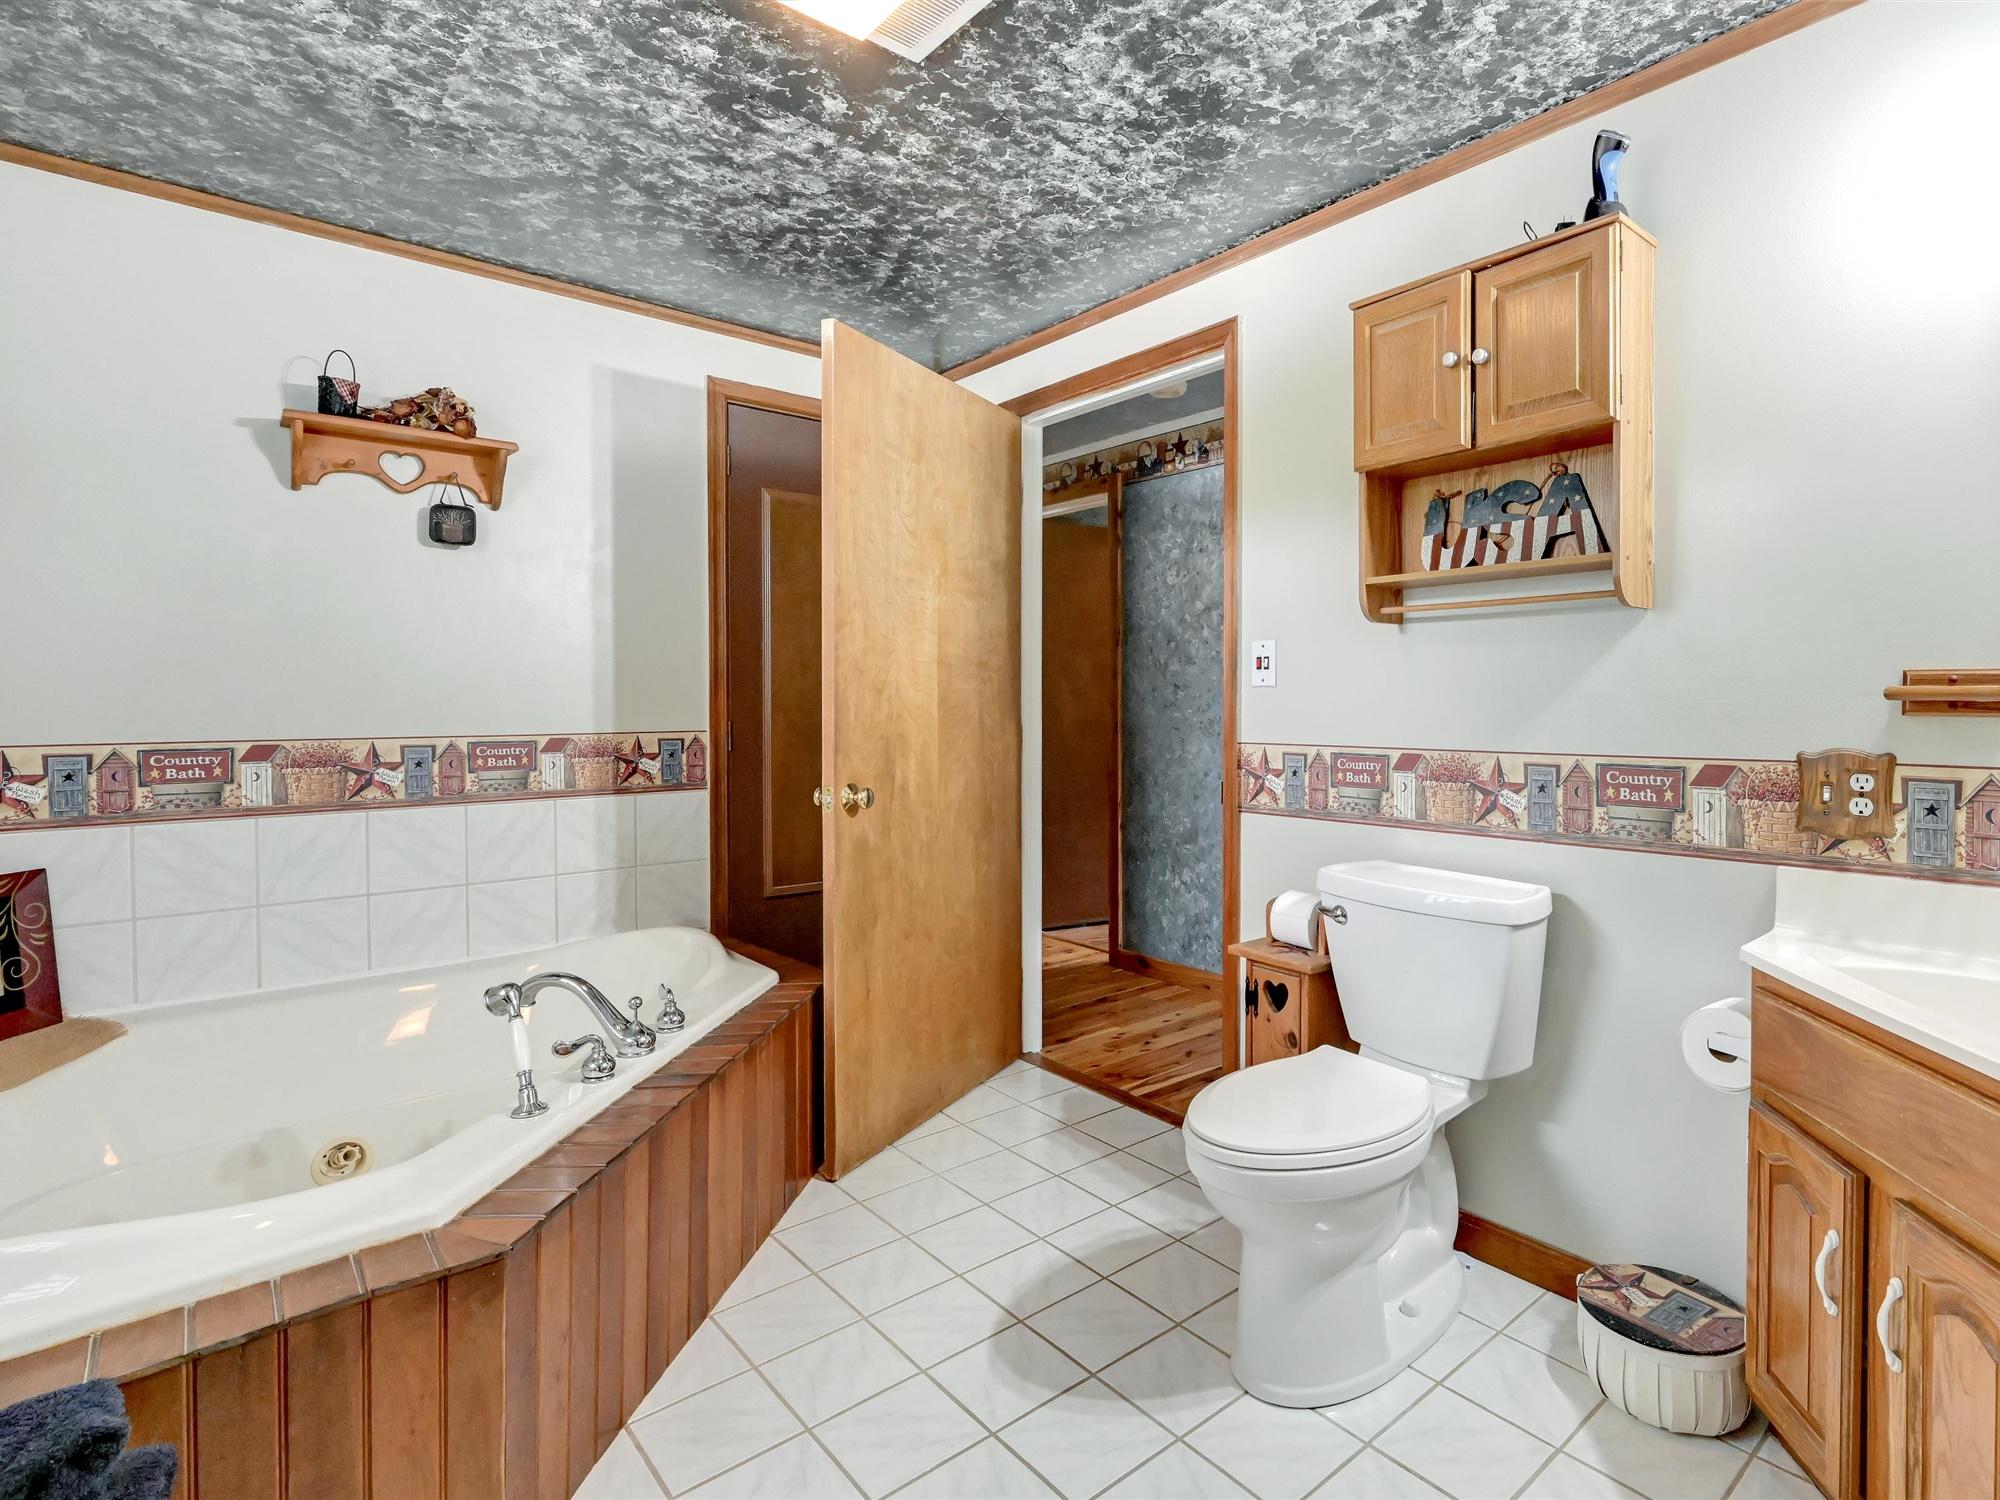 1617 Greenwood Dr. - Master Bathroom with Tub